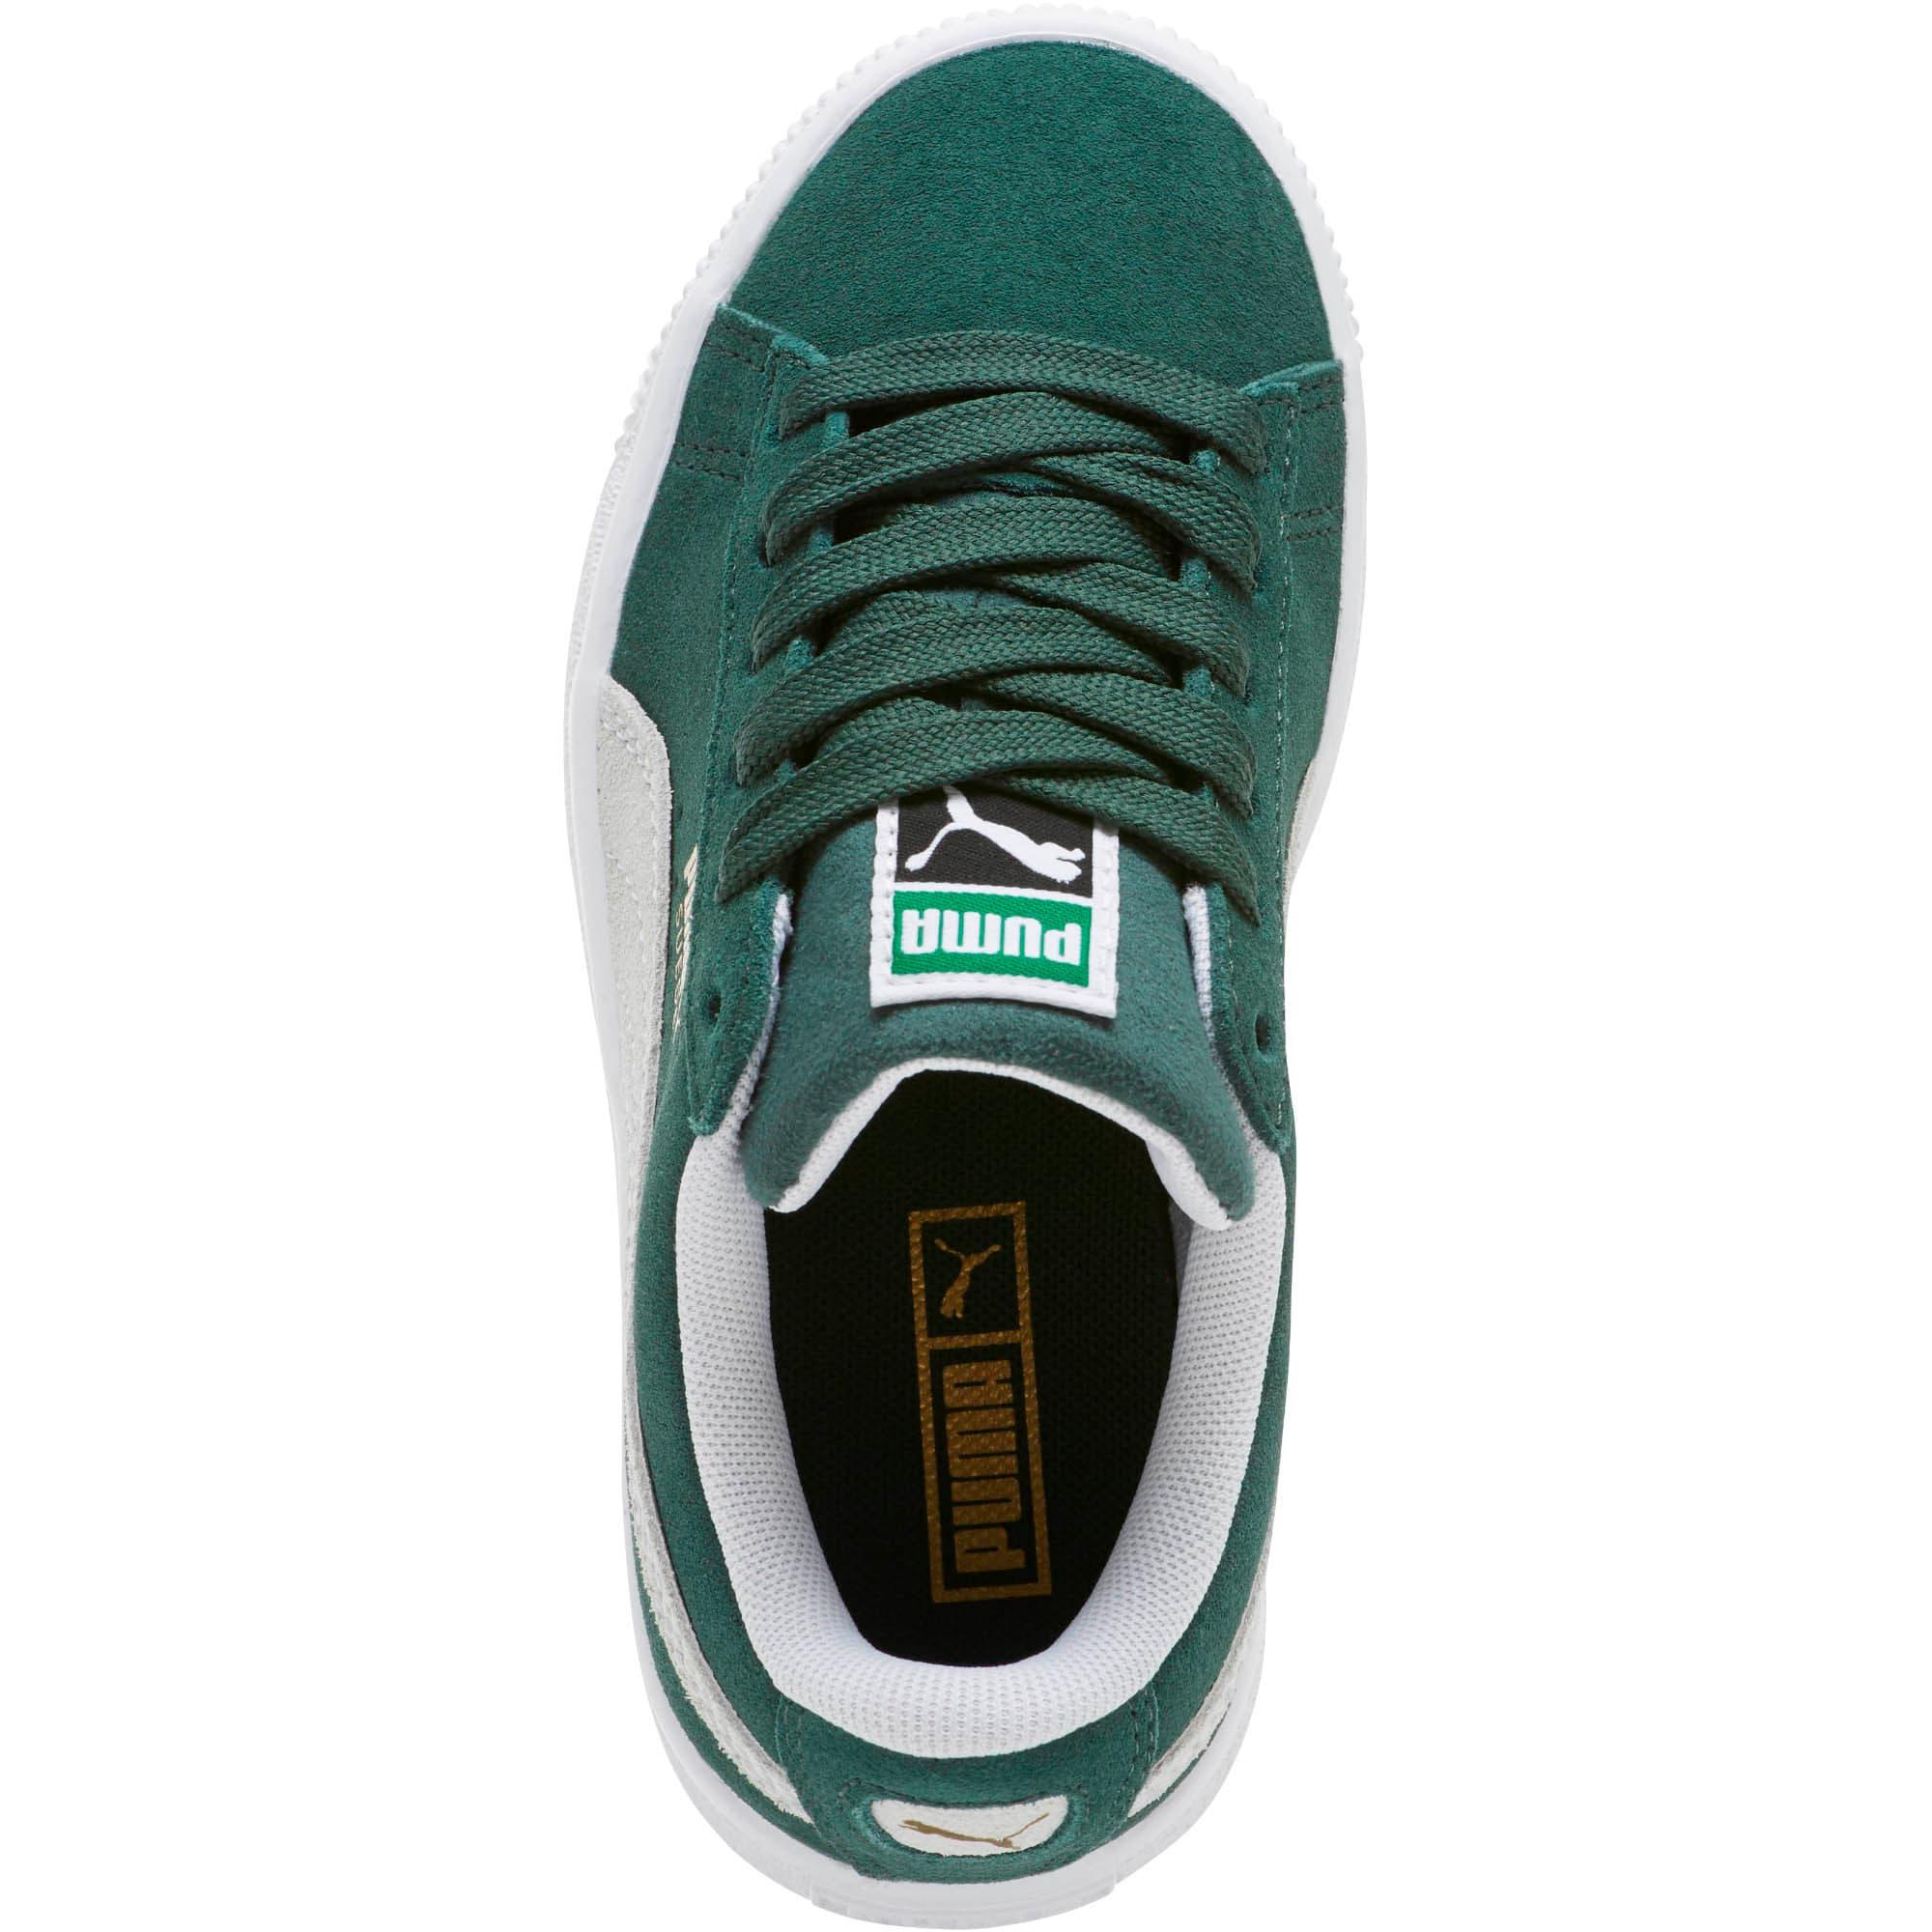 Thumbnail 5 of Suede Classics Little Kids' Shoes, Pineneedle-Puma White, medium